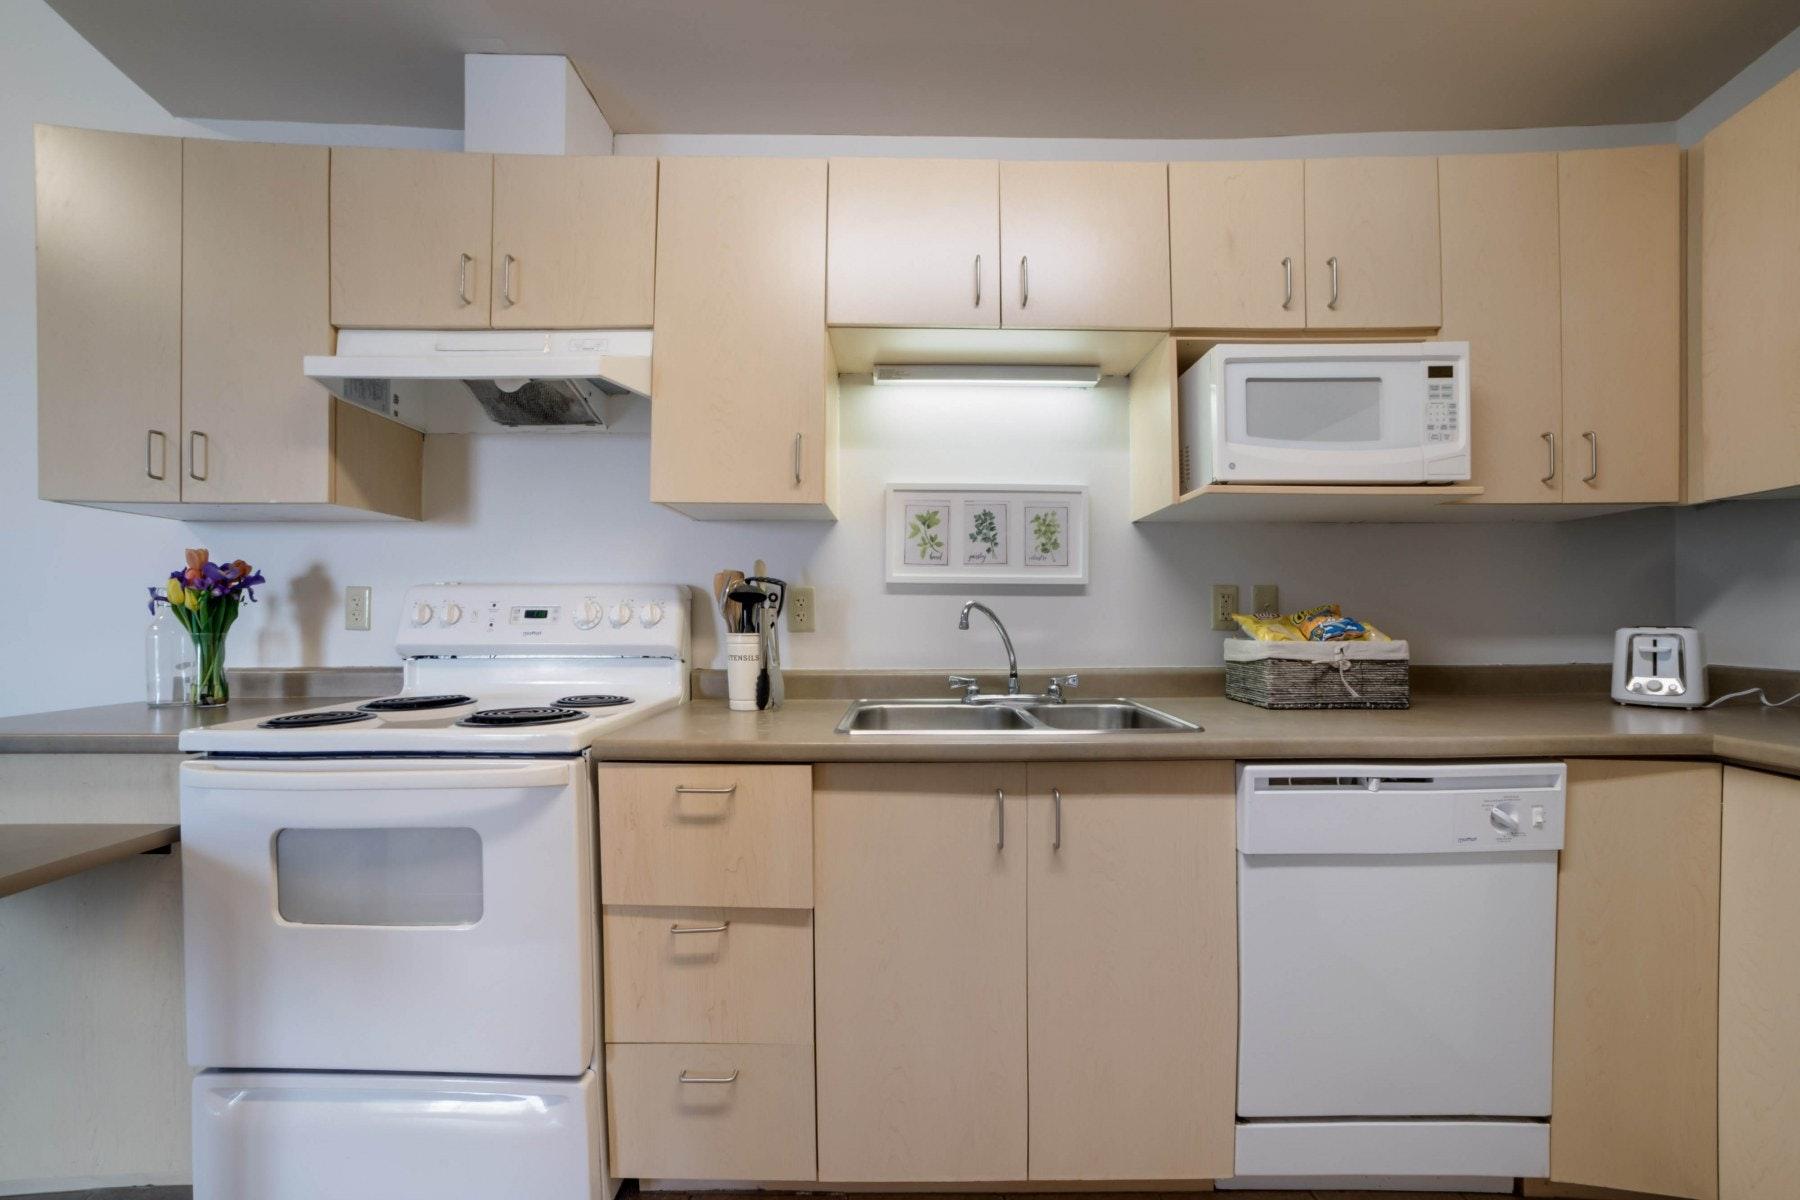 Kitchen with stove, microwave, dishwasher